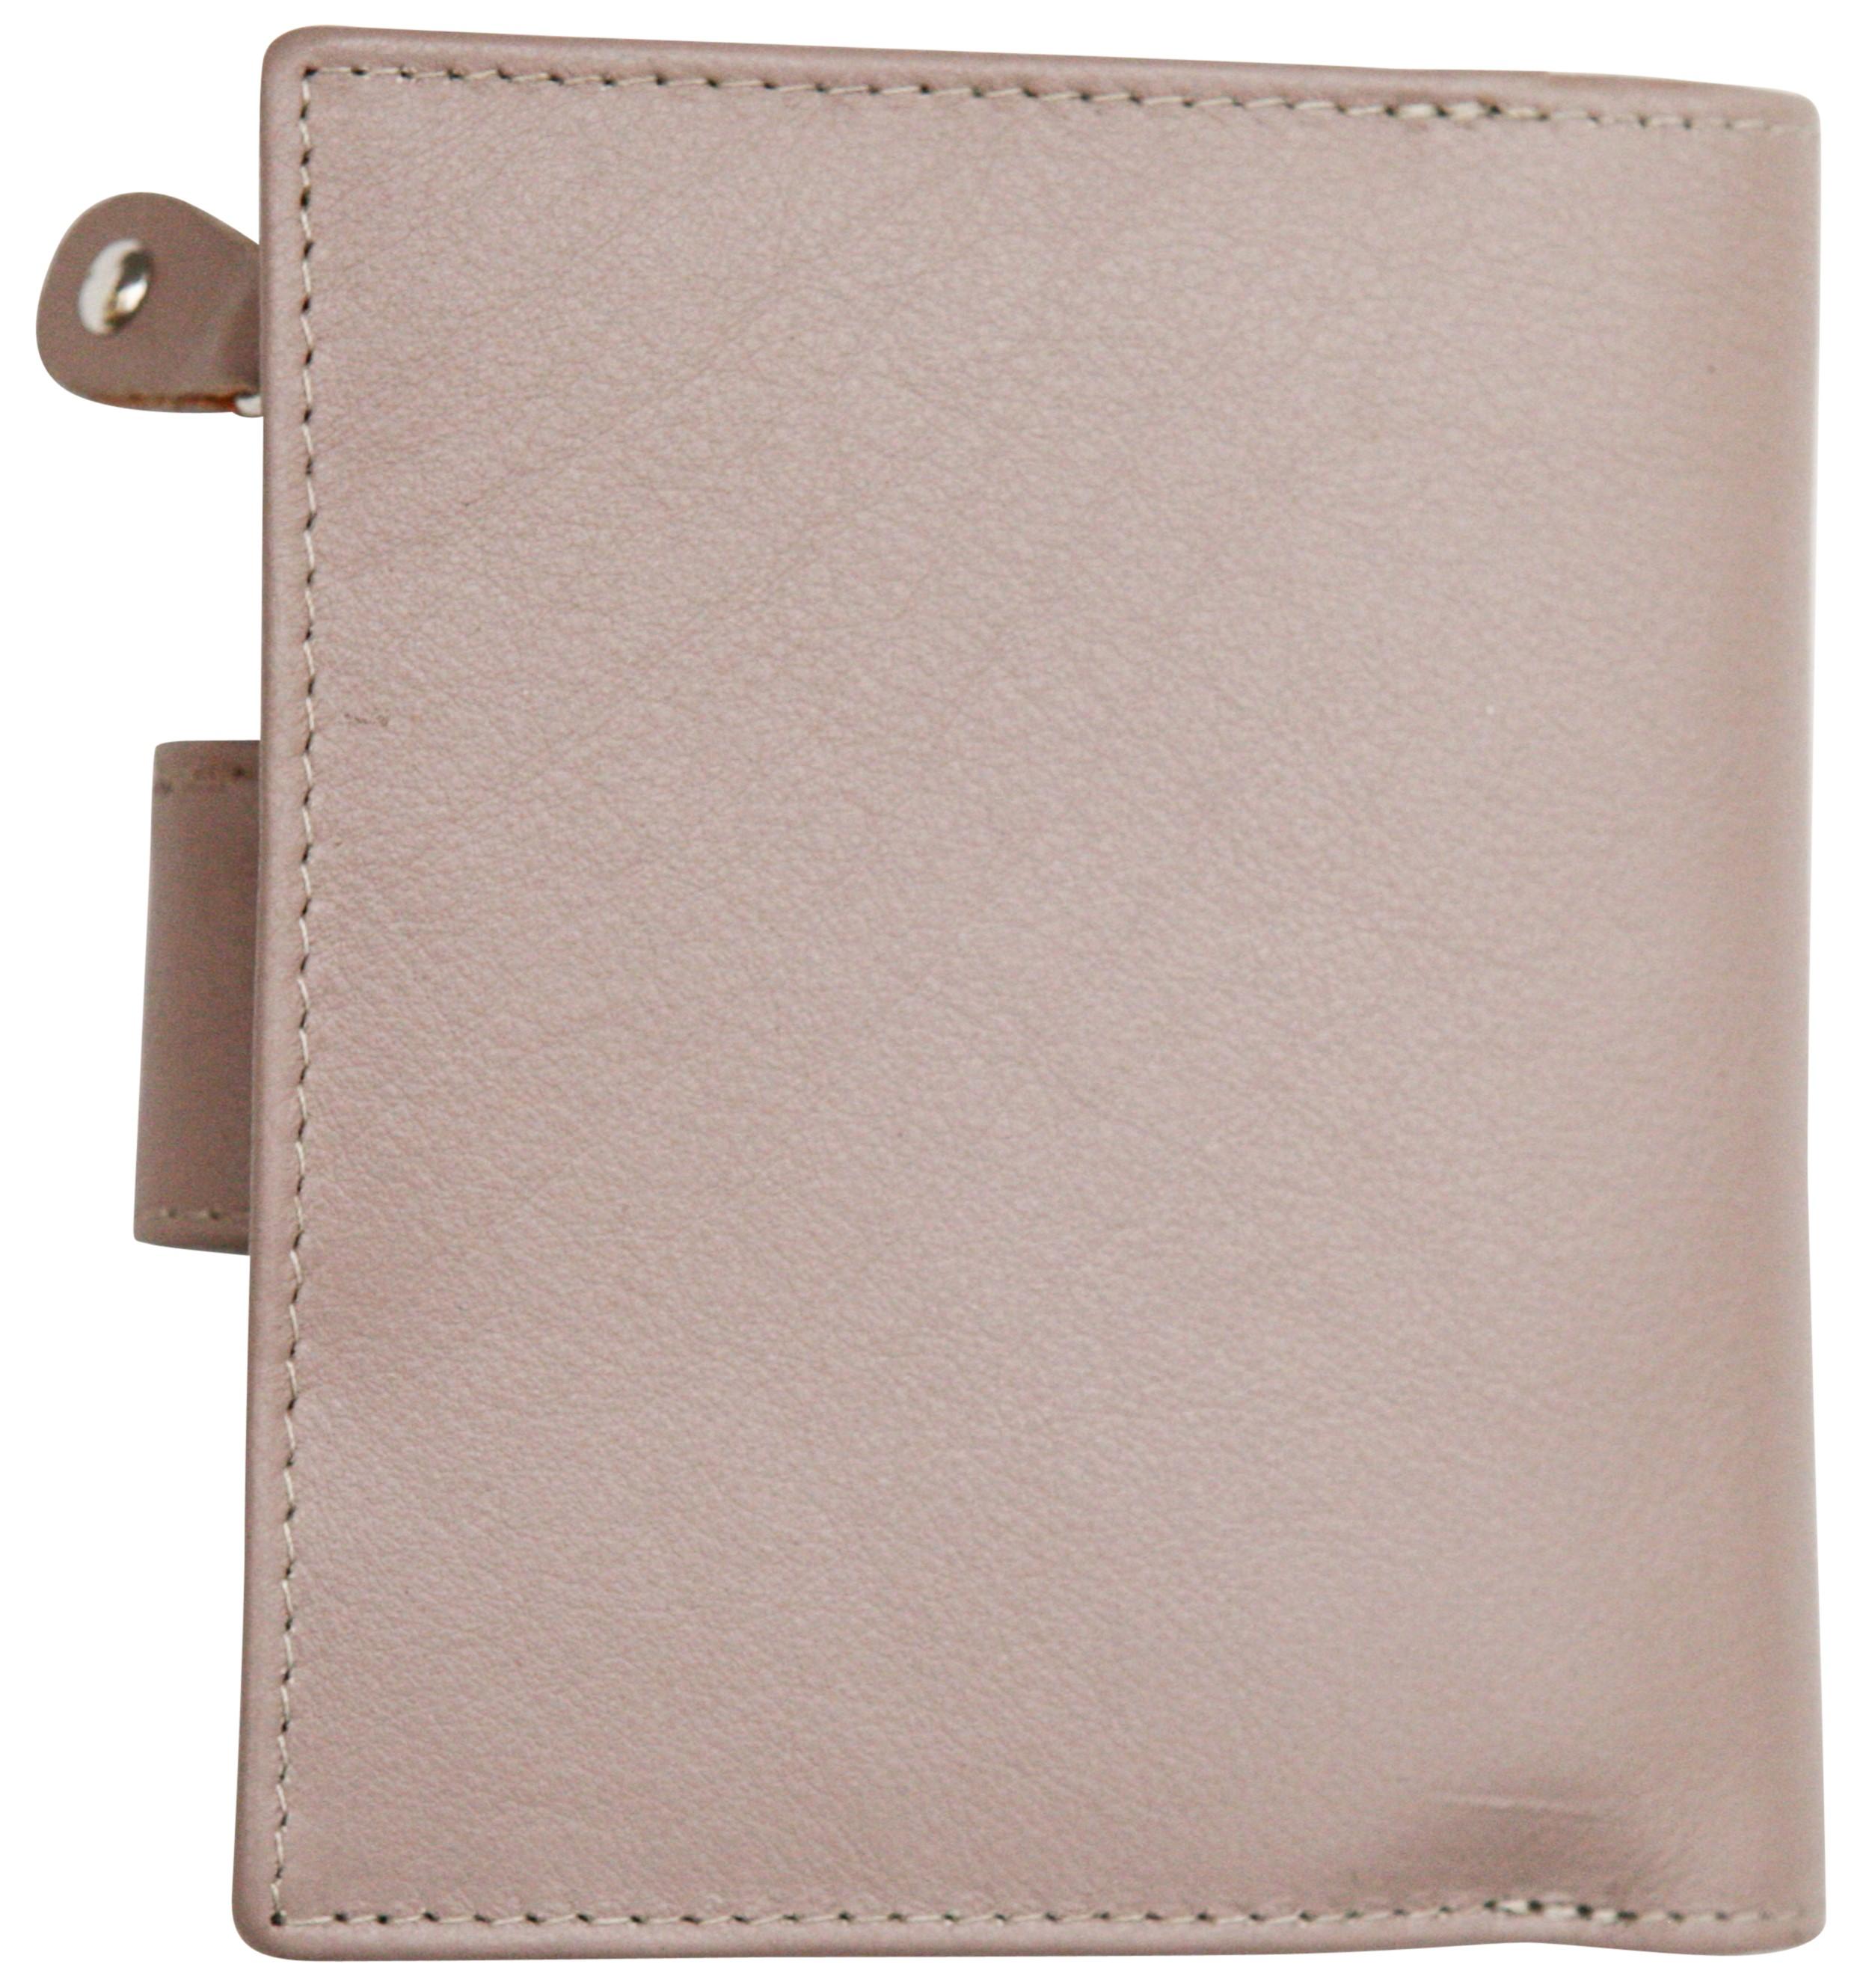 Felda-RFID-onorevoli-MEDAGLIA-amp-Card-Purse-Wallet-Genuine-Leather-Multi-SOFT-BOX-REGALO miniatura 79